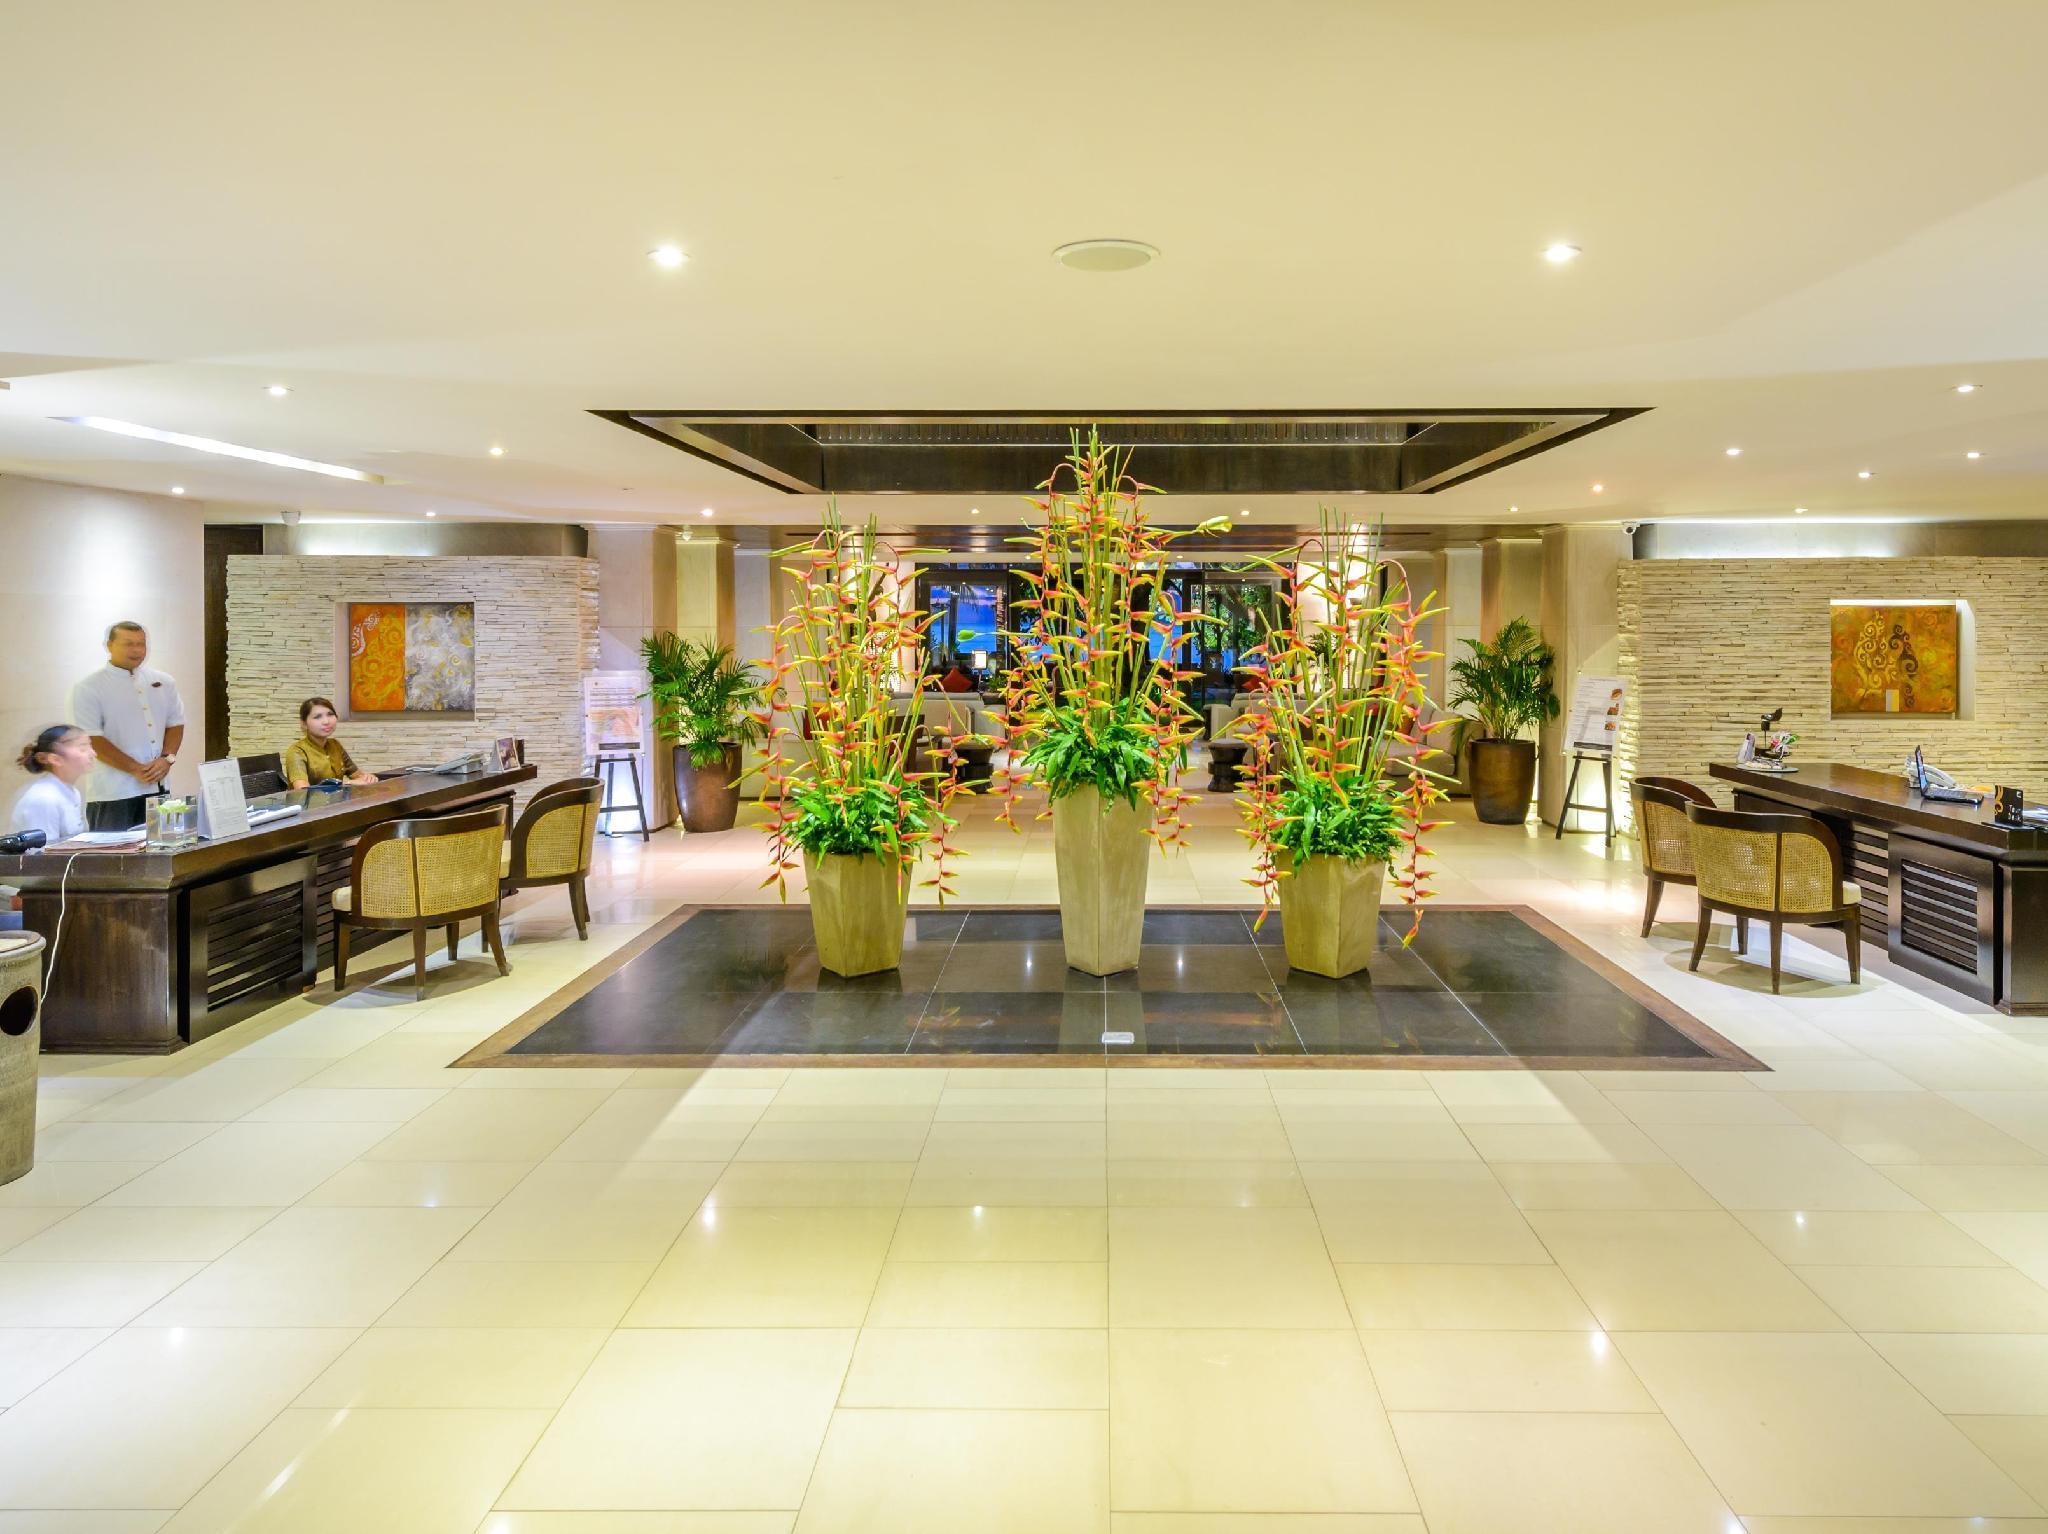 Impiana Resort Patong อิมเพียน่า รีสอร์ท ป่าตอง